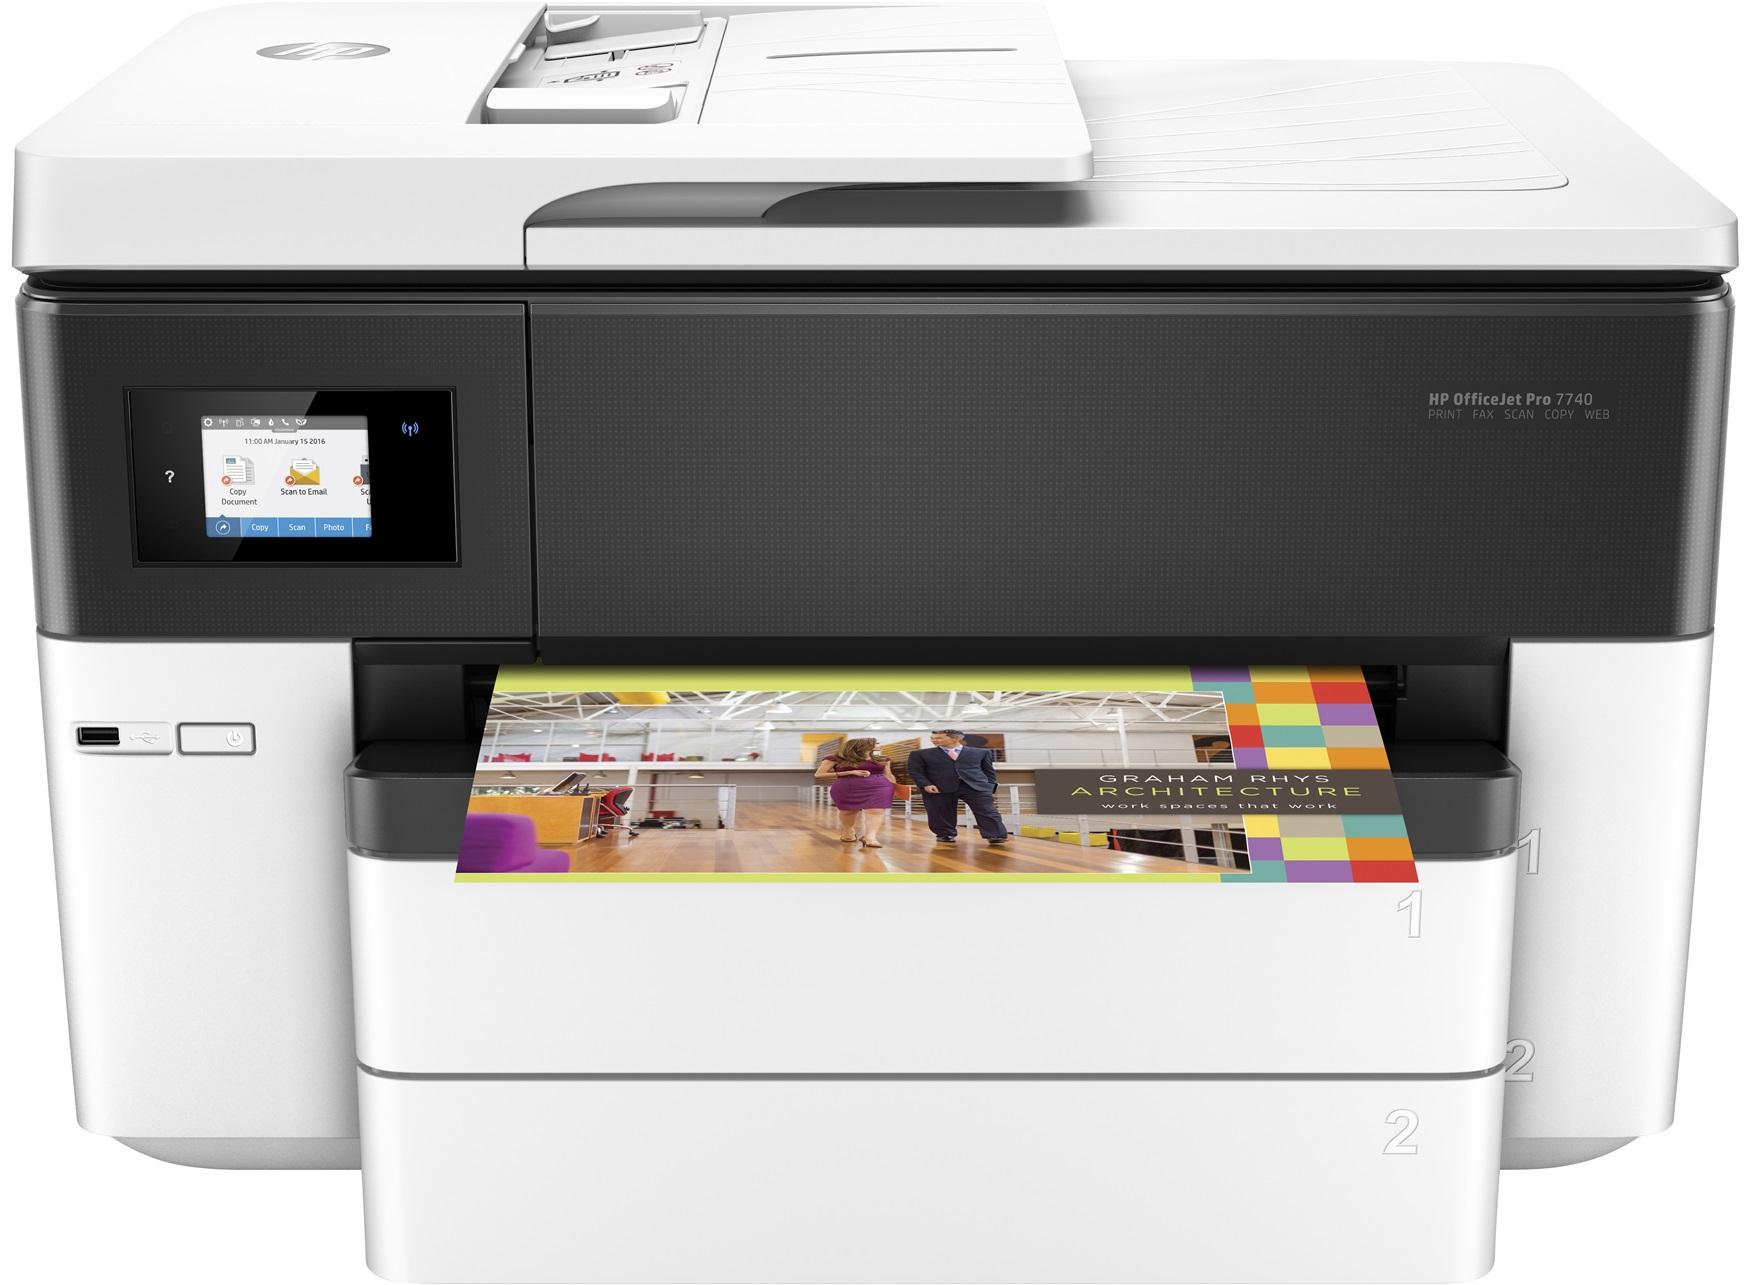 HP OfficeJet Pro 7740, Tinte, MFP, A3